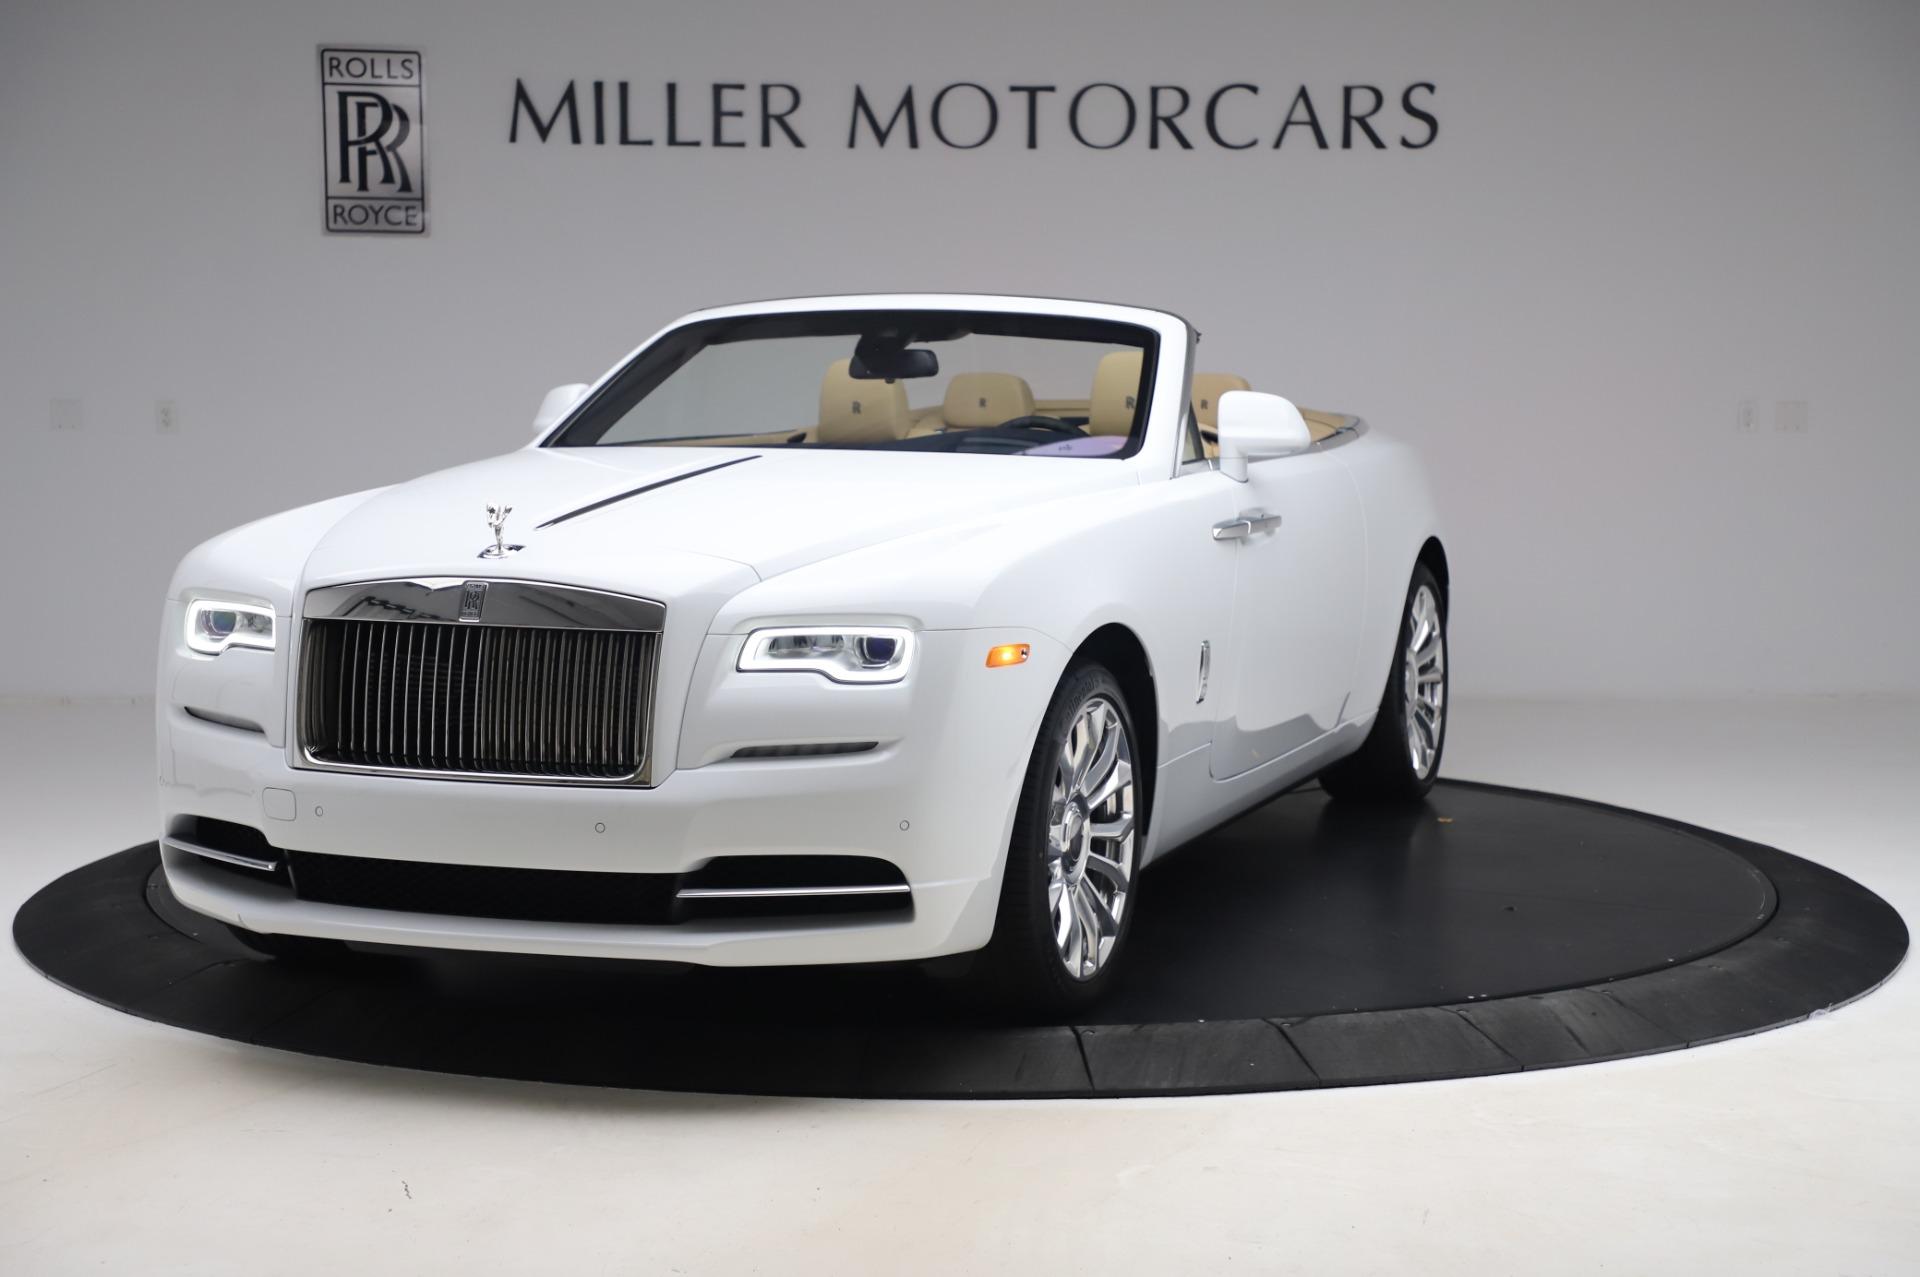 New 2020 Rolls-Royce Dawn for sale $382,100 at Rolls-Royce Motor Cars Greenwich in Greenwich CT 06830 1